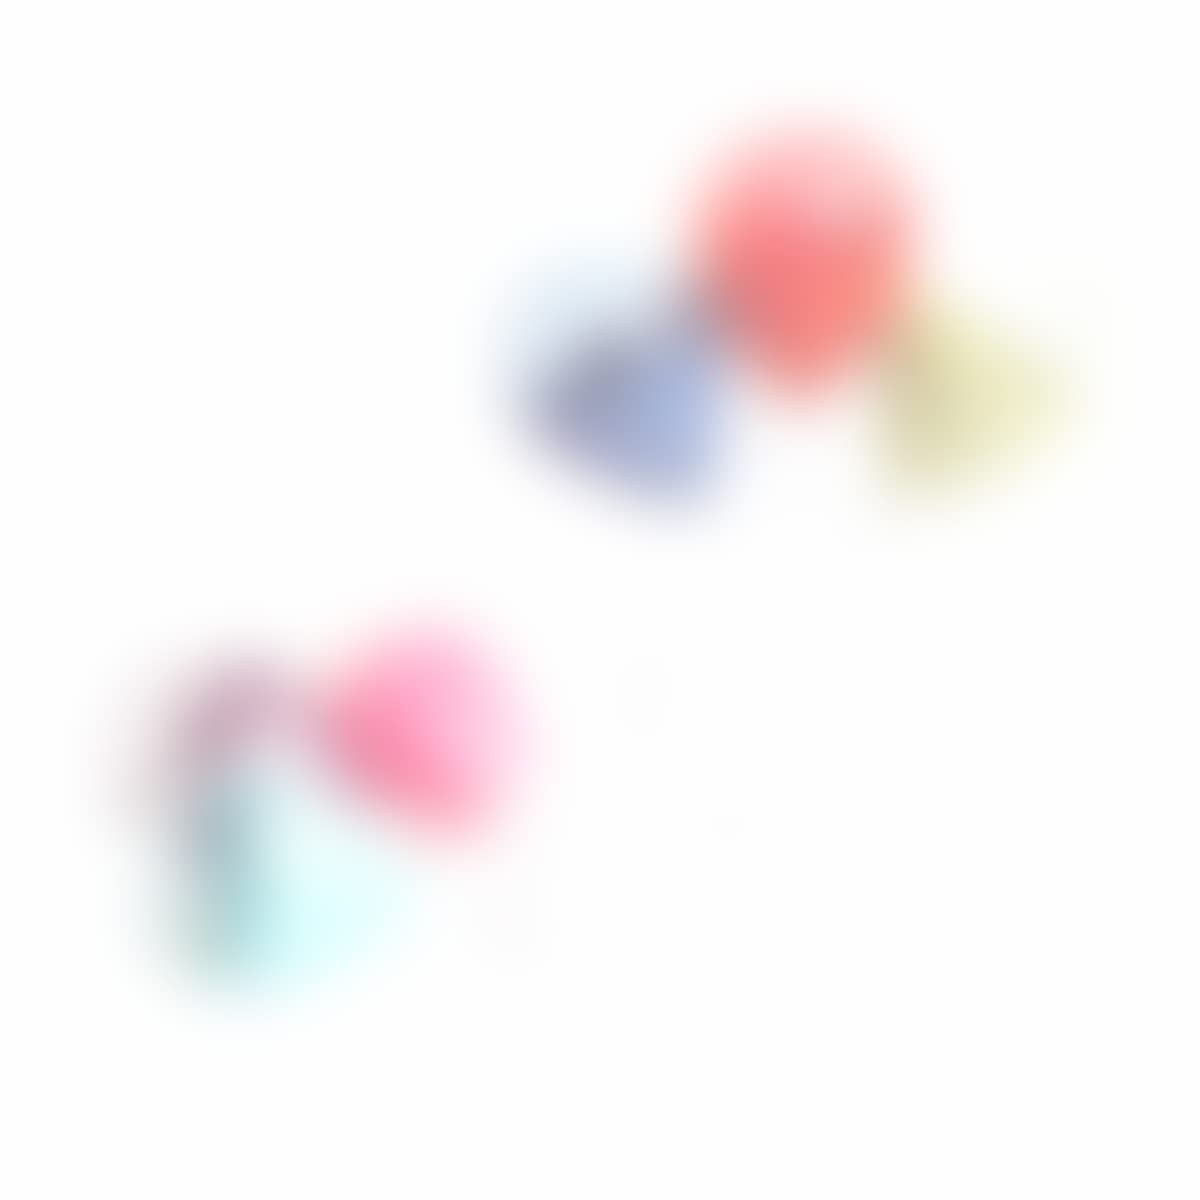 Súper Canastilla con Productos SUAVINEX | PERSONALIZABLE: Añade Maxi Cupcake con un body, chupete, portachupete o sonajero SUAVINEX | Disponible Versión ...